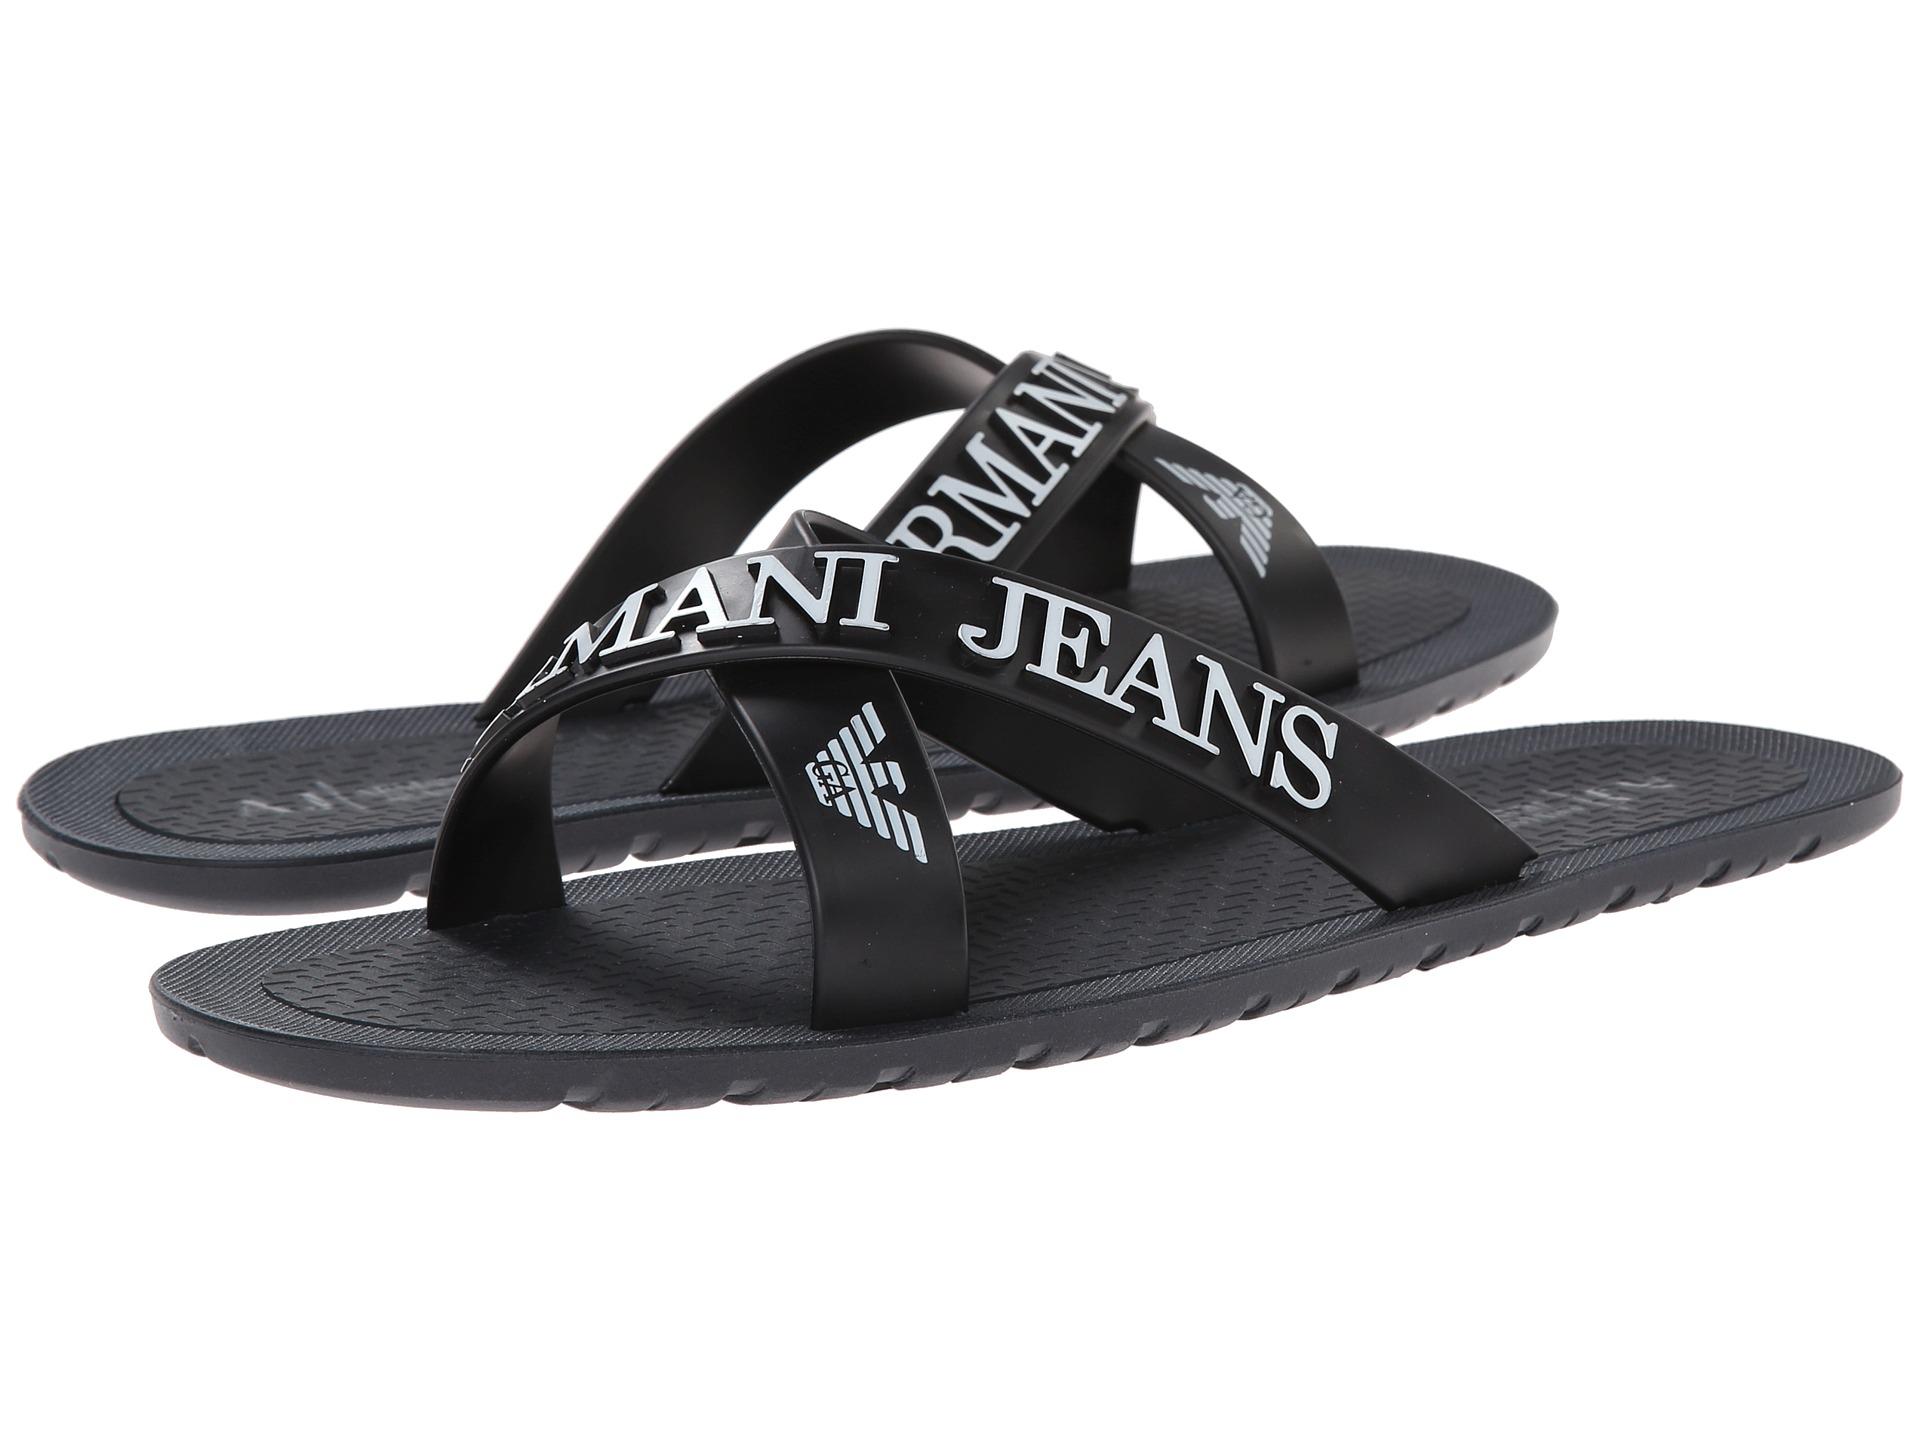 d89b7dd7056b Lyst - Armani Jeans Crossover Casual Flip Flops in Blue for Men